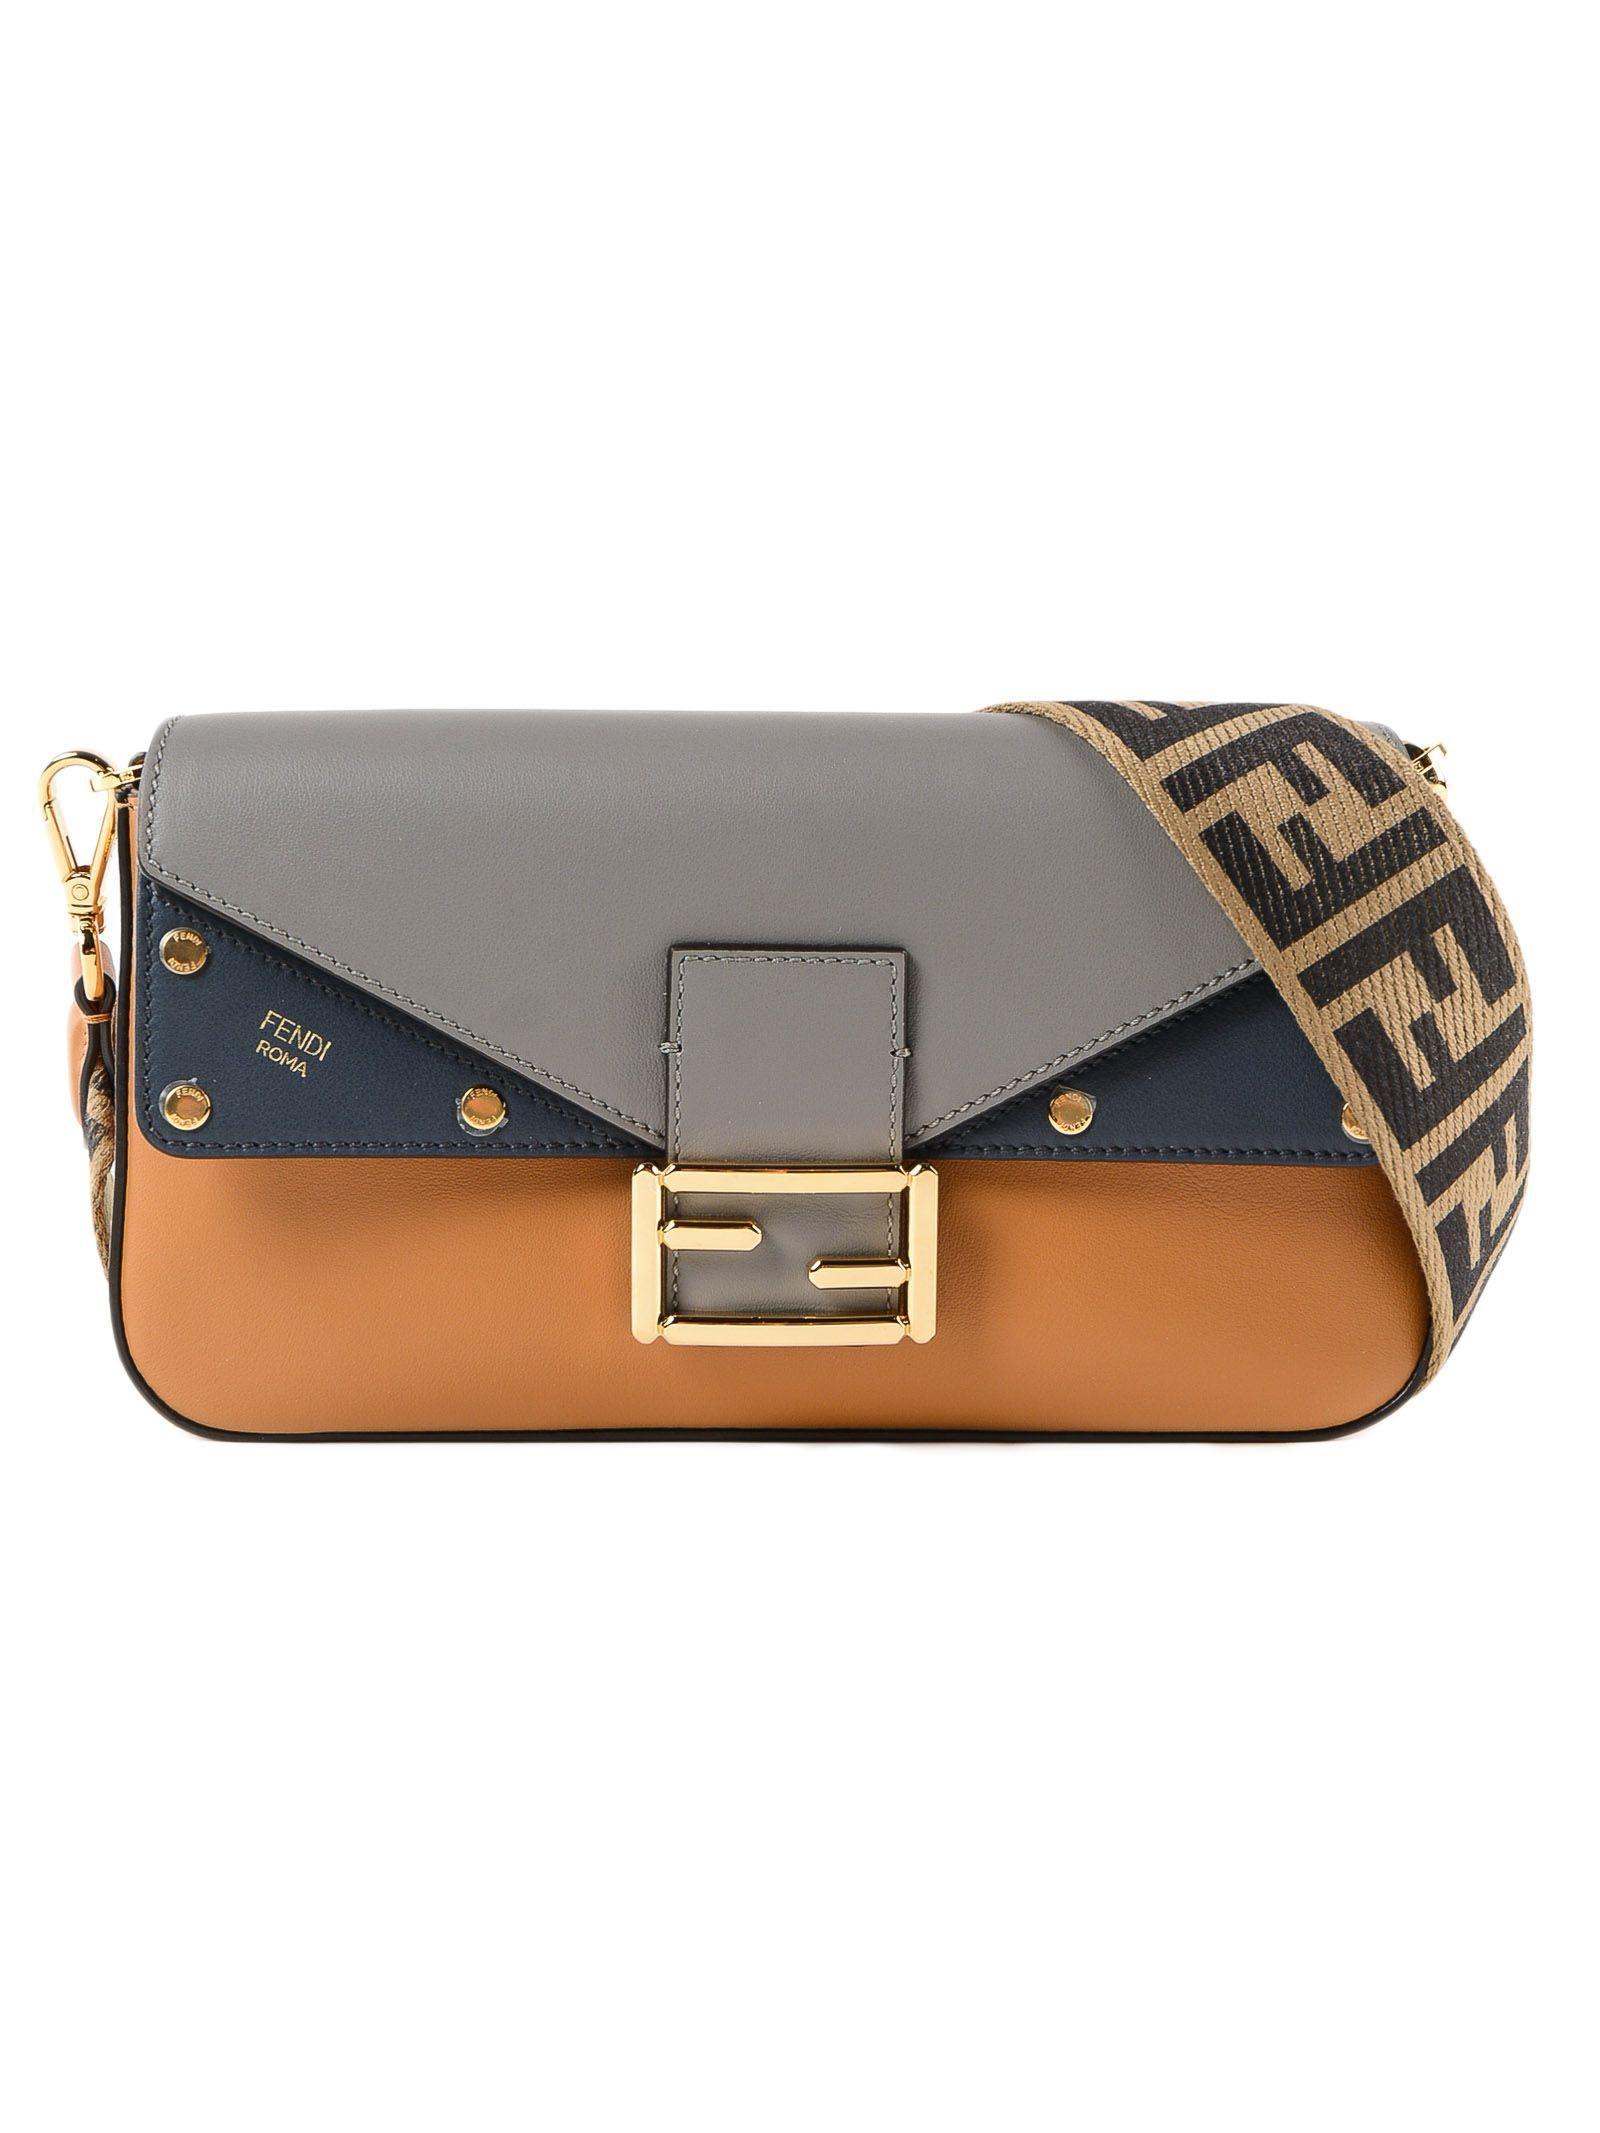 7553b83605c2 FENDI Fendi Baguette Shoulder Bag.  fendi  bags